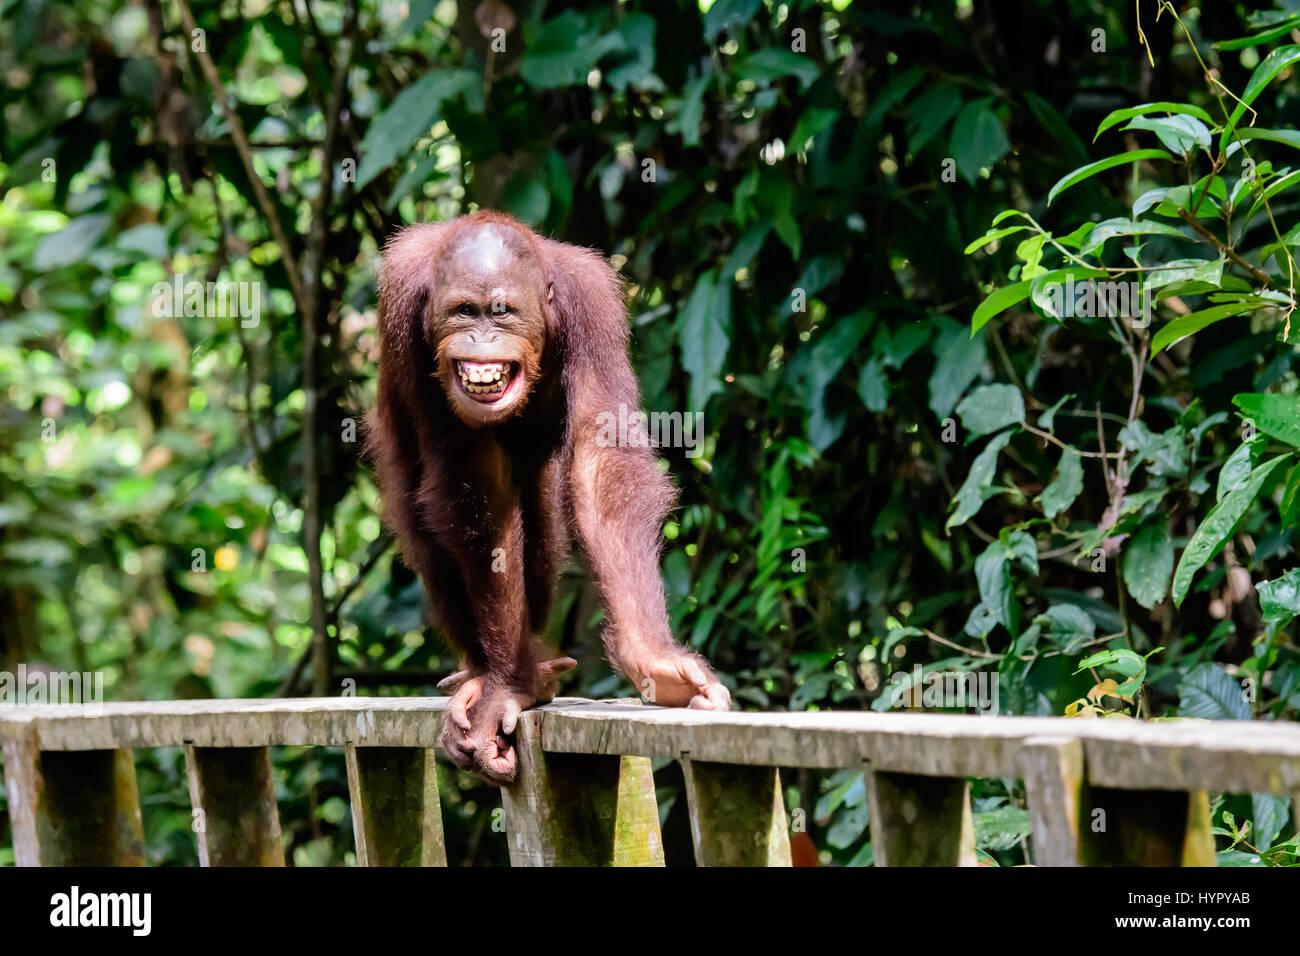 Cheeky grinning Orangutan approaching - Stock Image